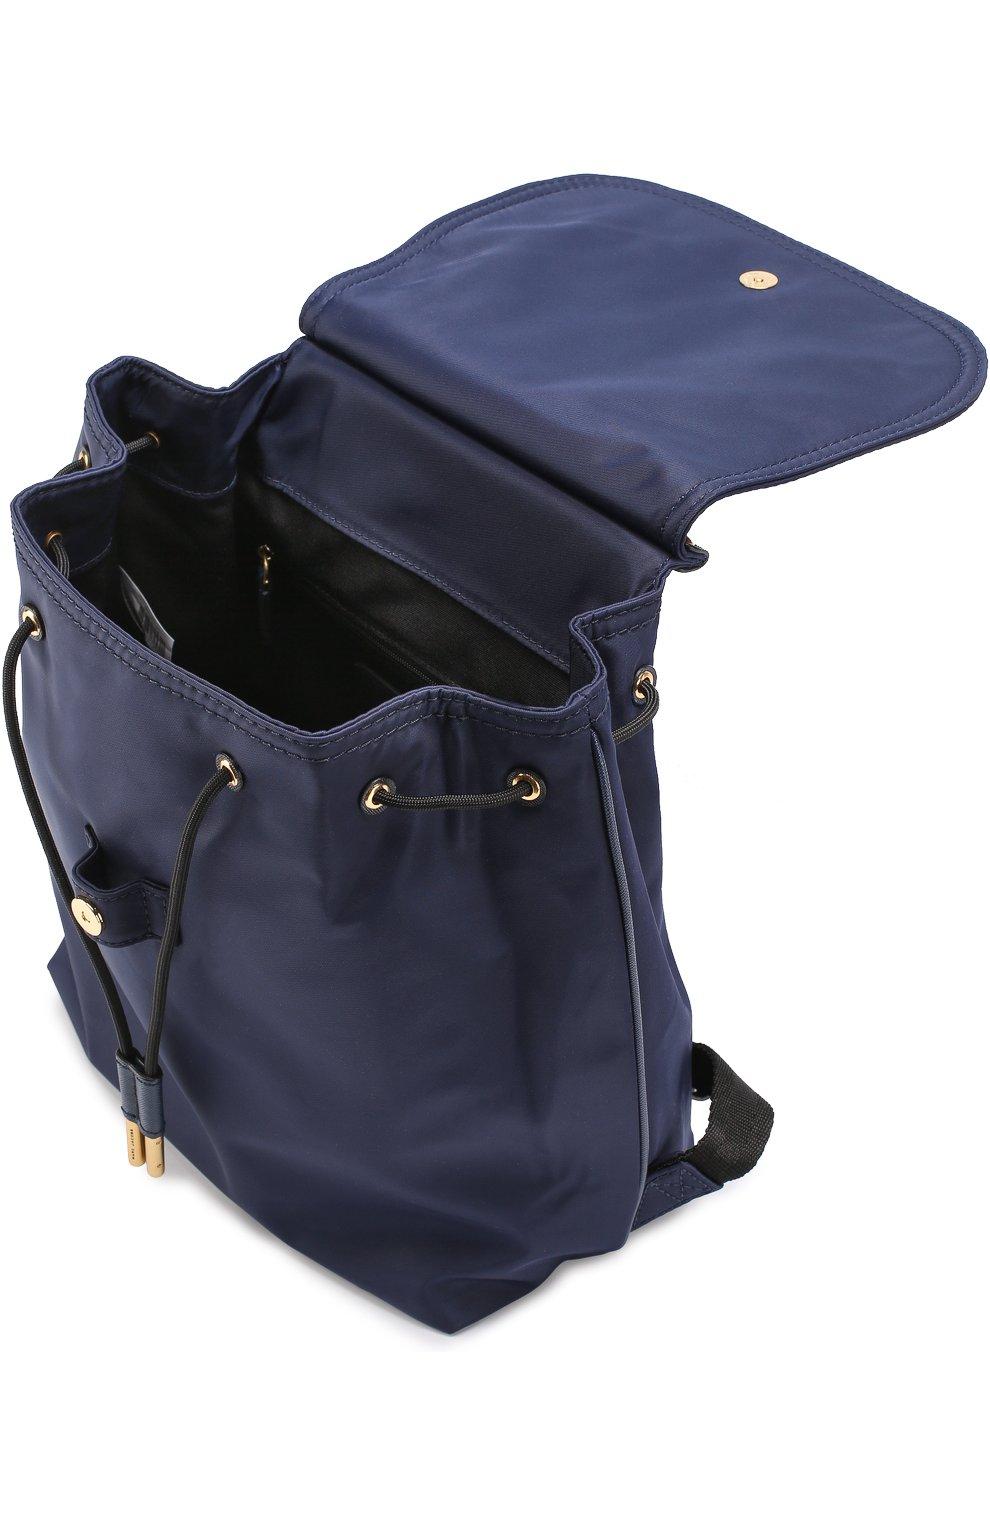 Текстильный рюкзак Trooper | Фото №3